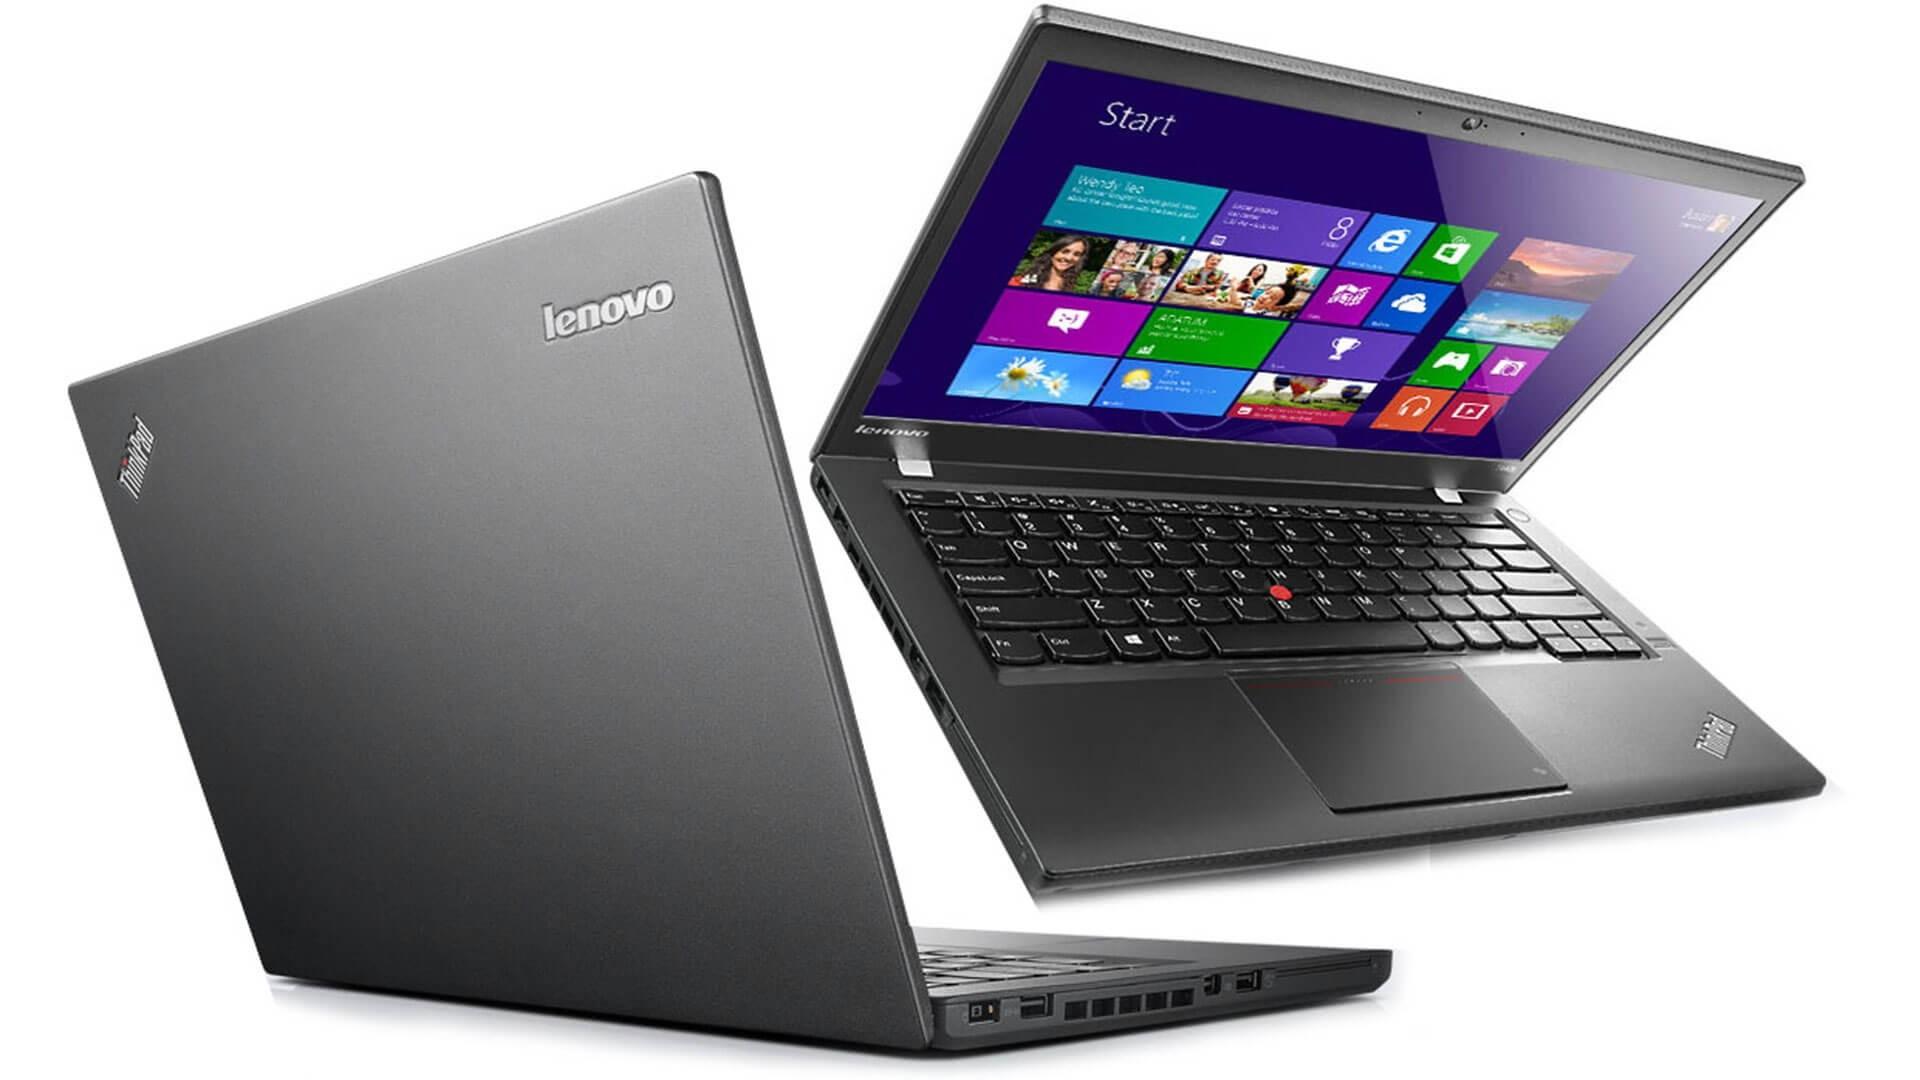 Lenovo Thinkpad T440s - Intel Core i5 4300U - 8GB - 180GB SSD - HDMI